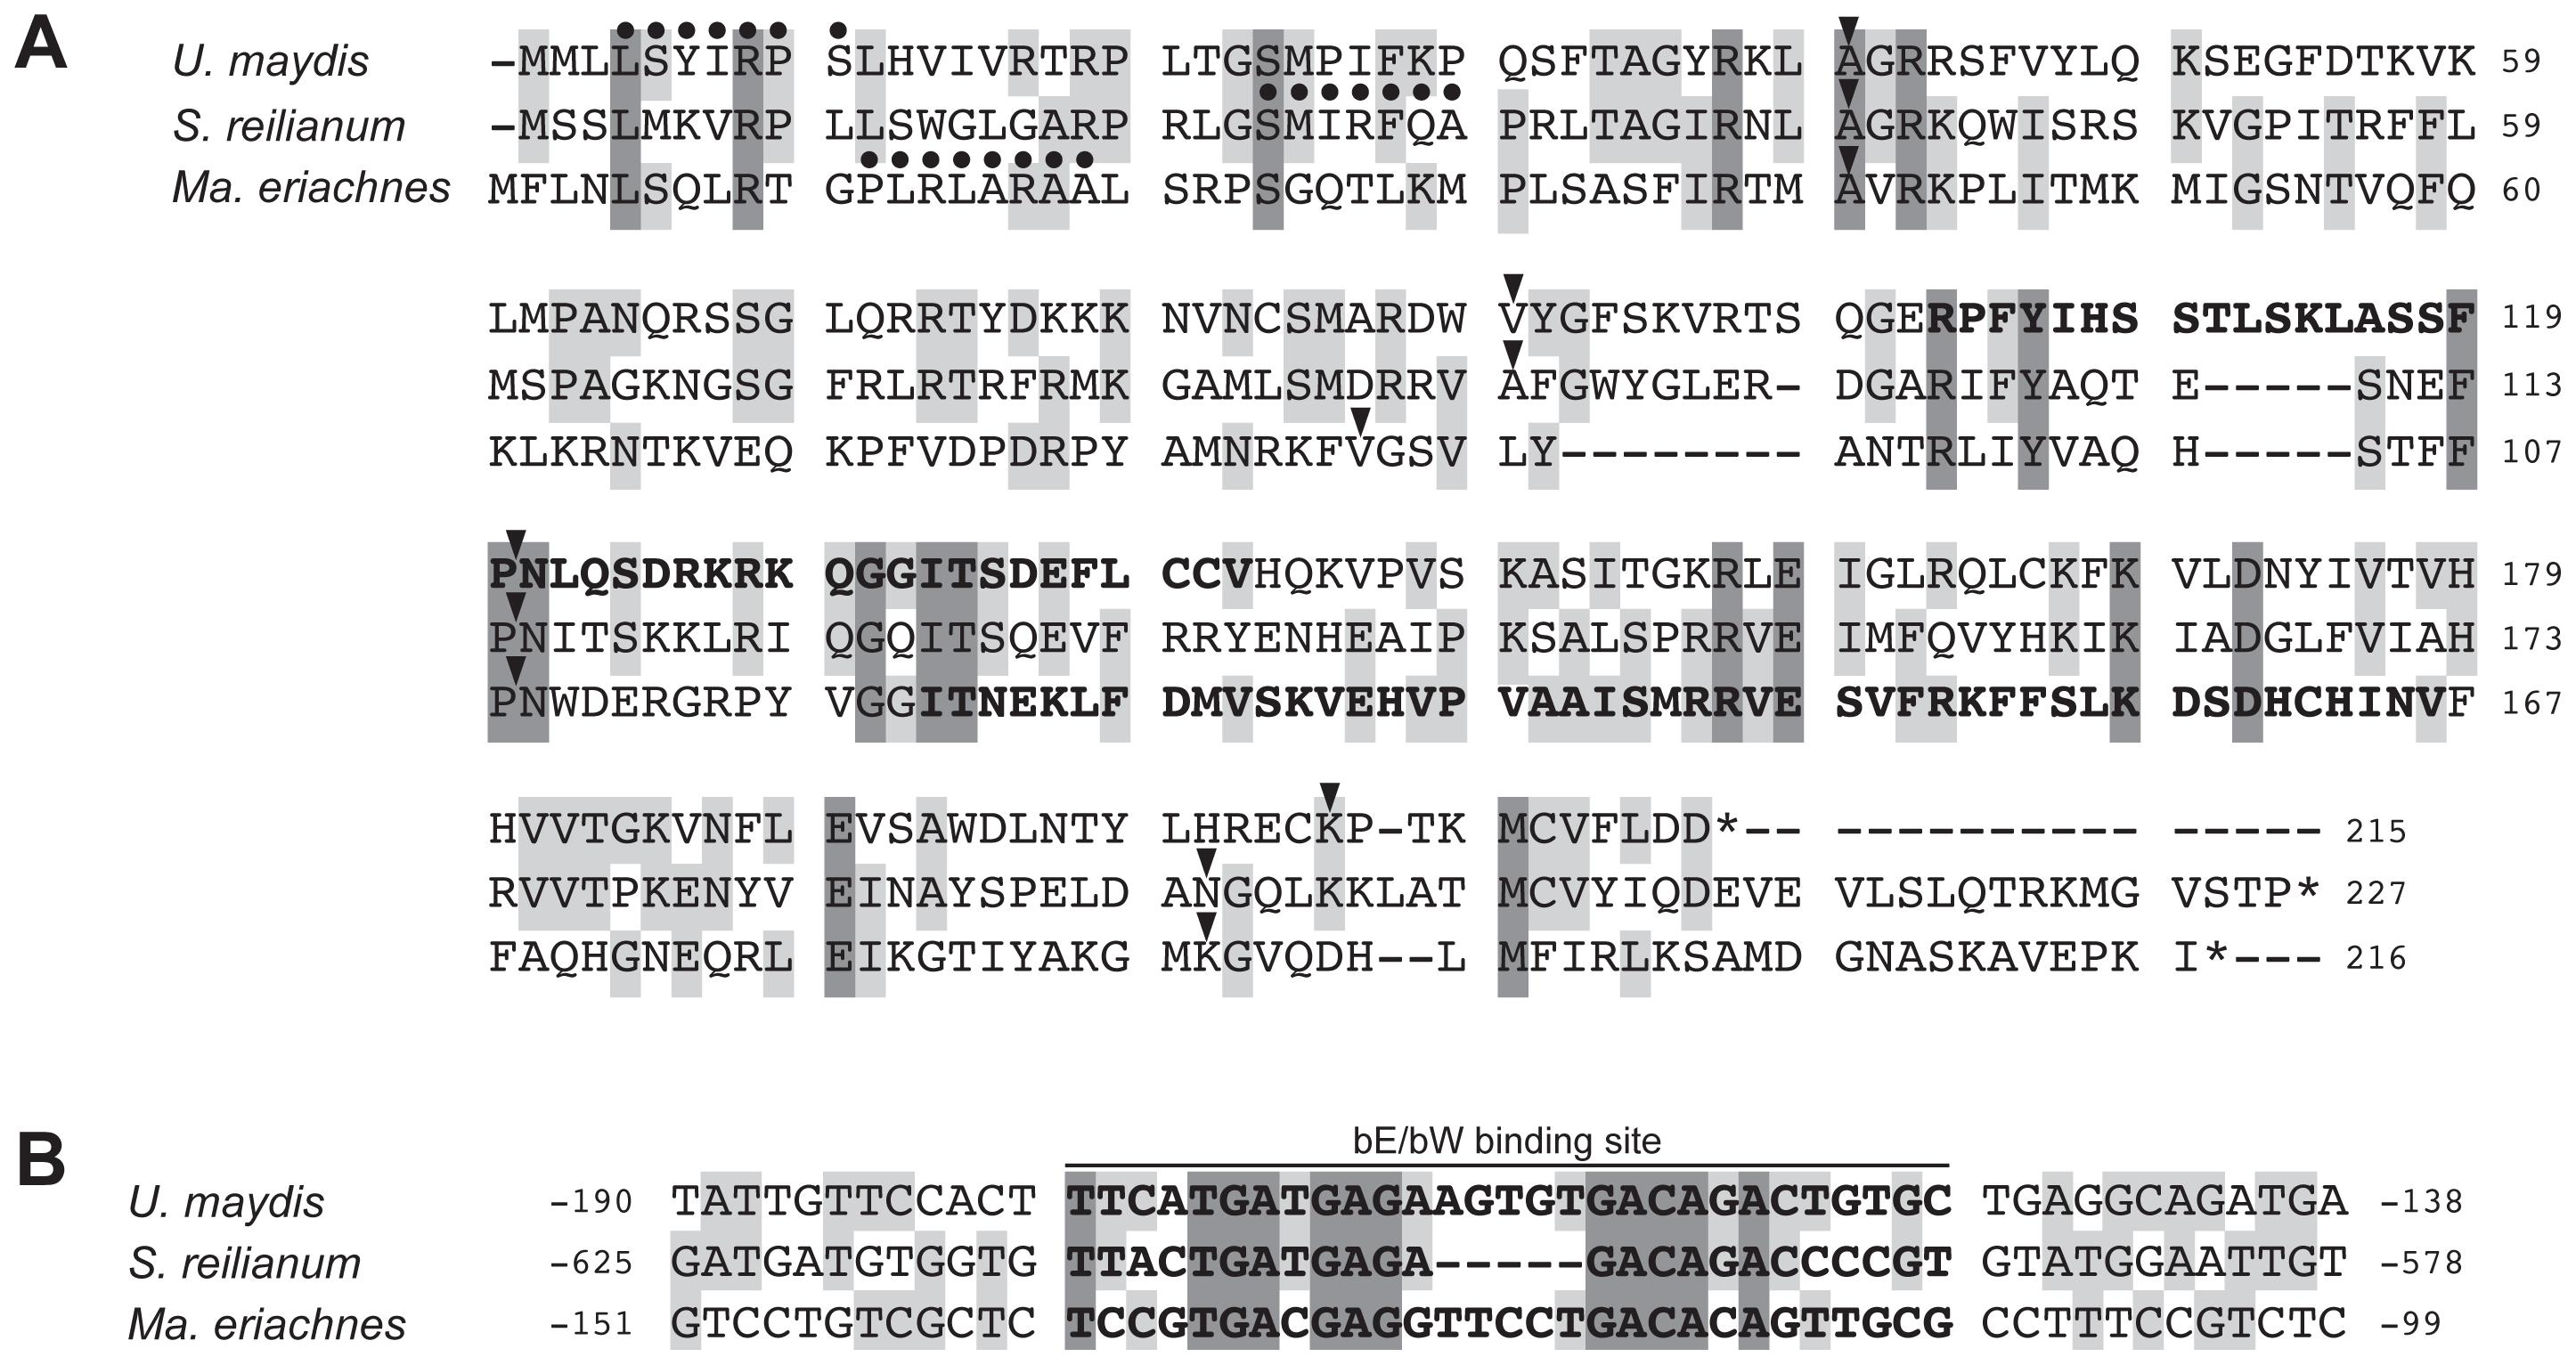 Multiple alignment of Lga2 homologs and their regulatory regions.